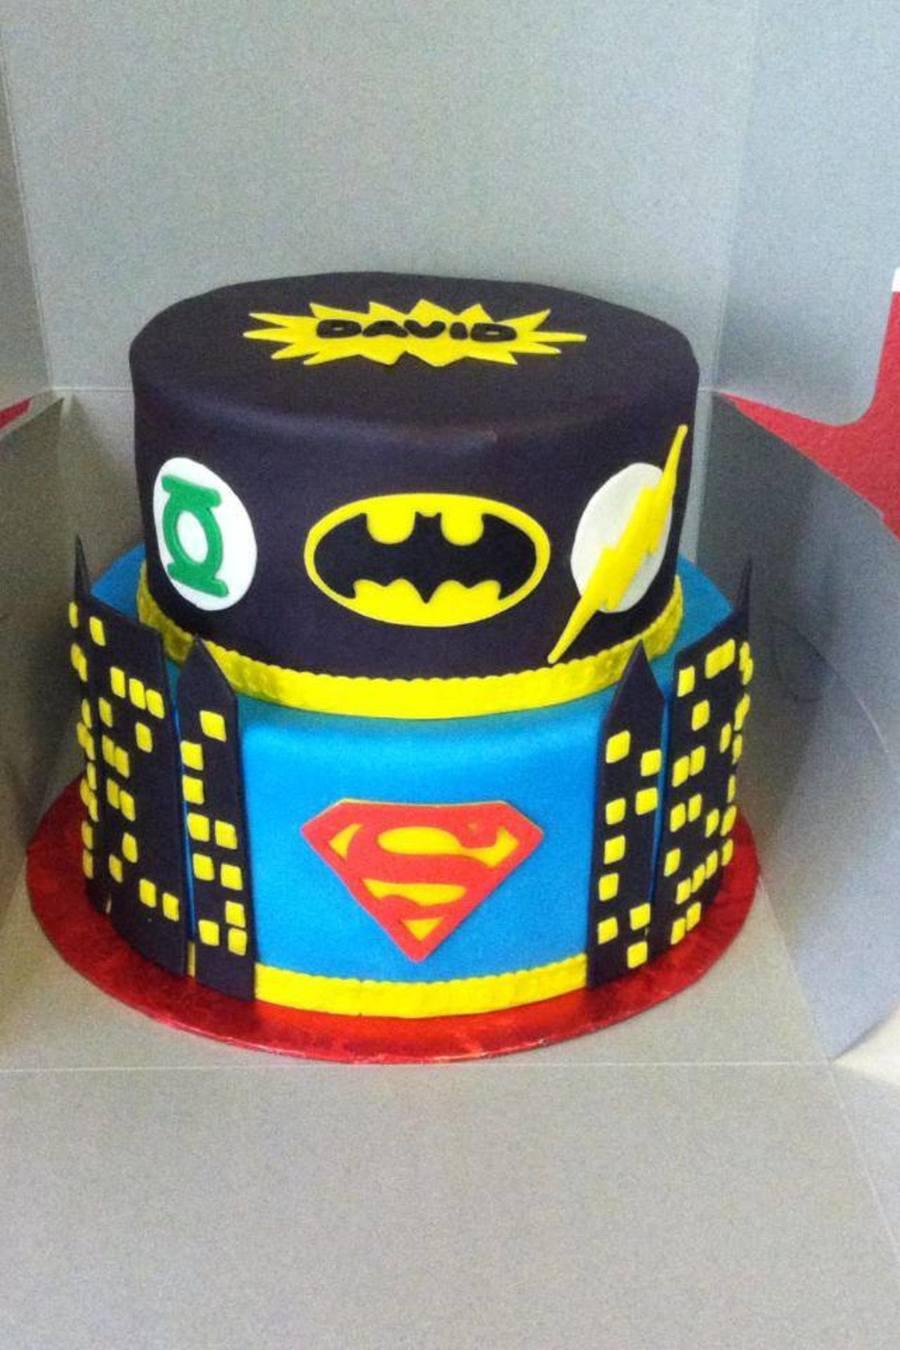 Marvelous Justice League Super Hero Birthday Cake Cakecentral Com Funny Birthday Cards Online Kookostrdamsfinfo